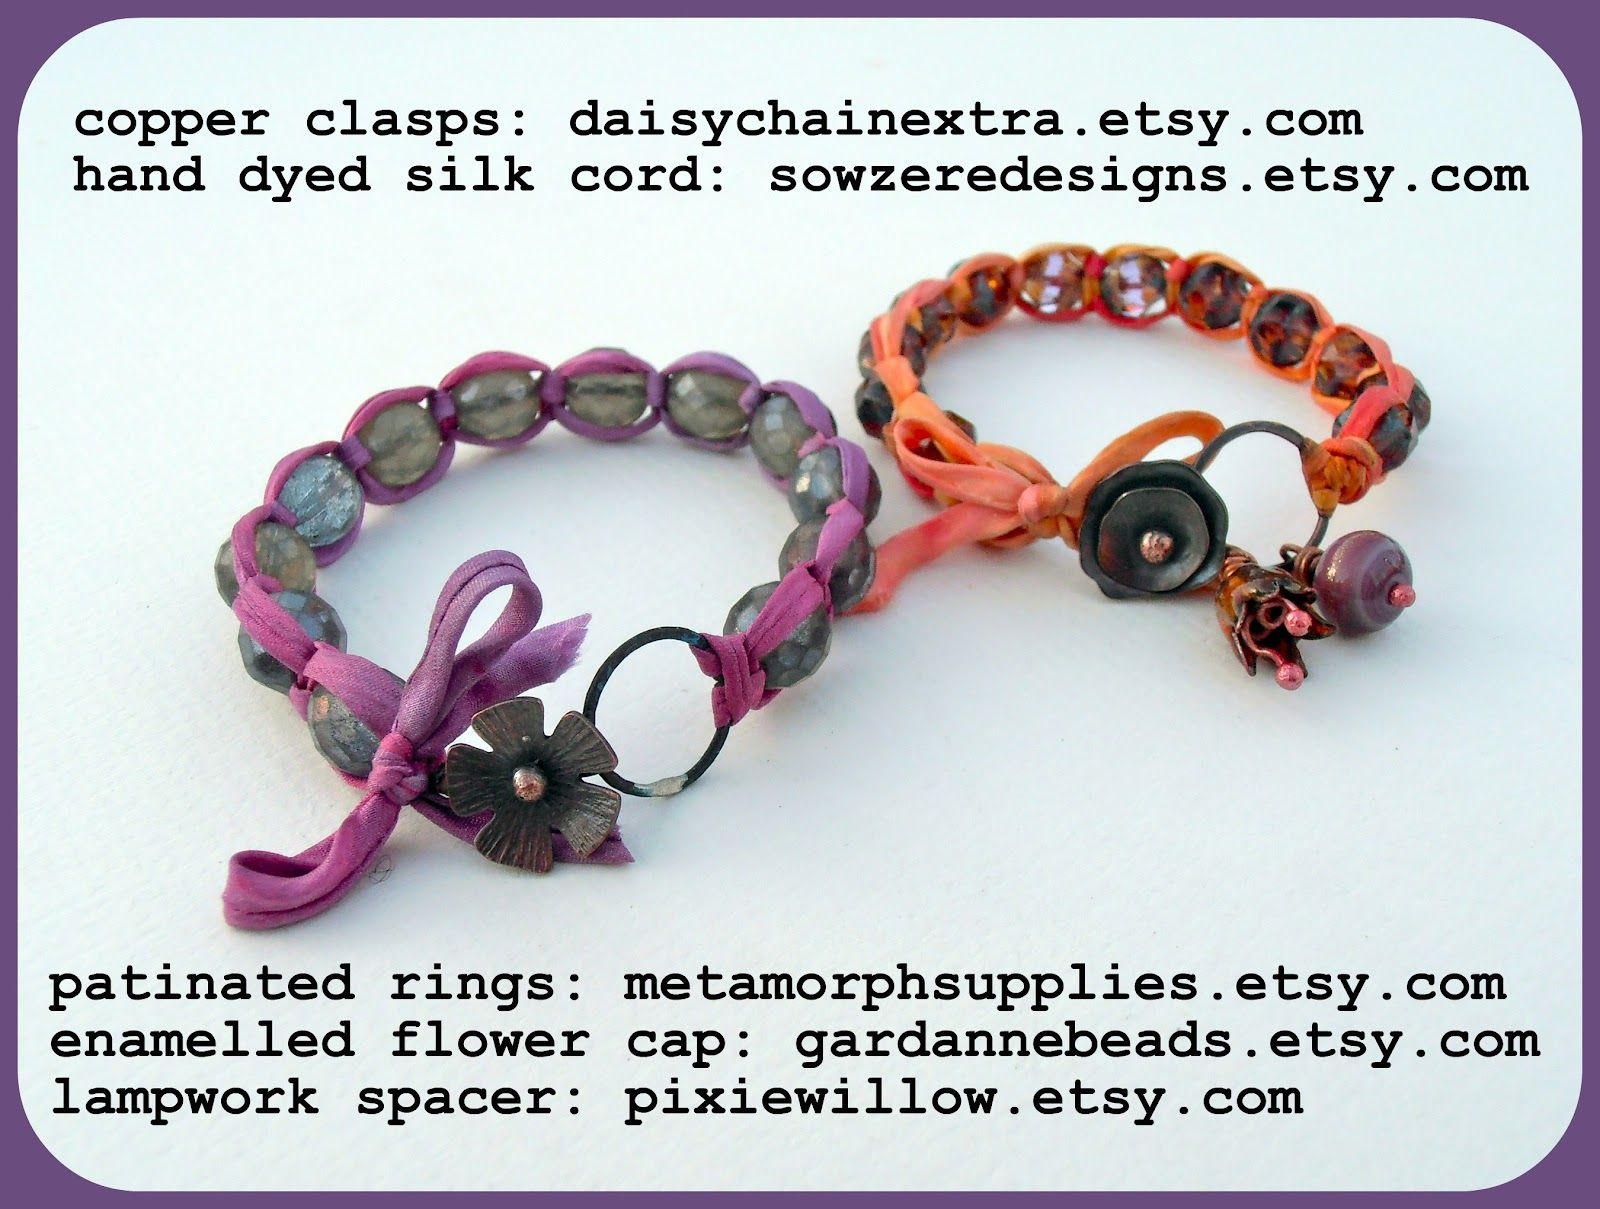 Square Knot Bracelet Tutorial with ribbon